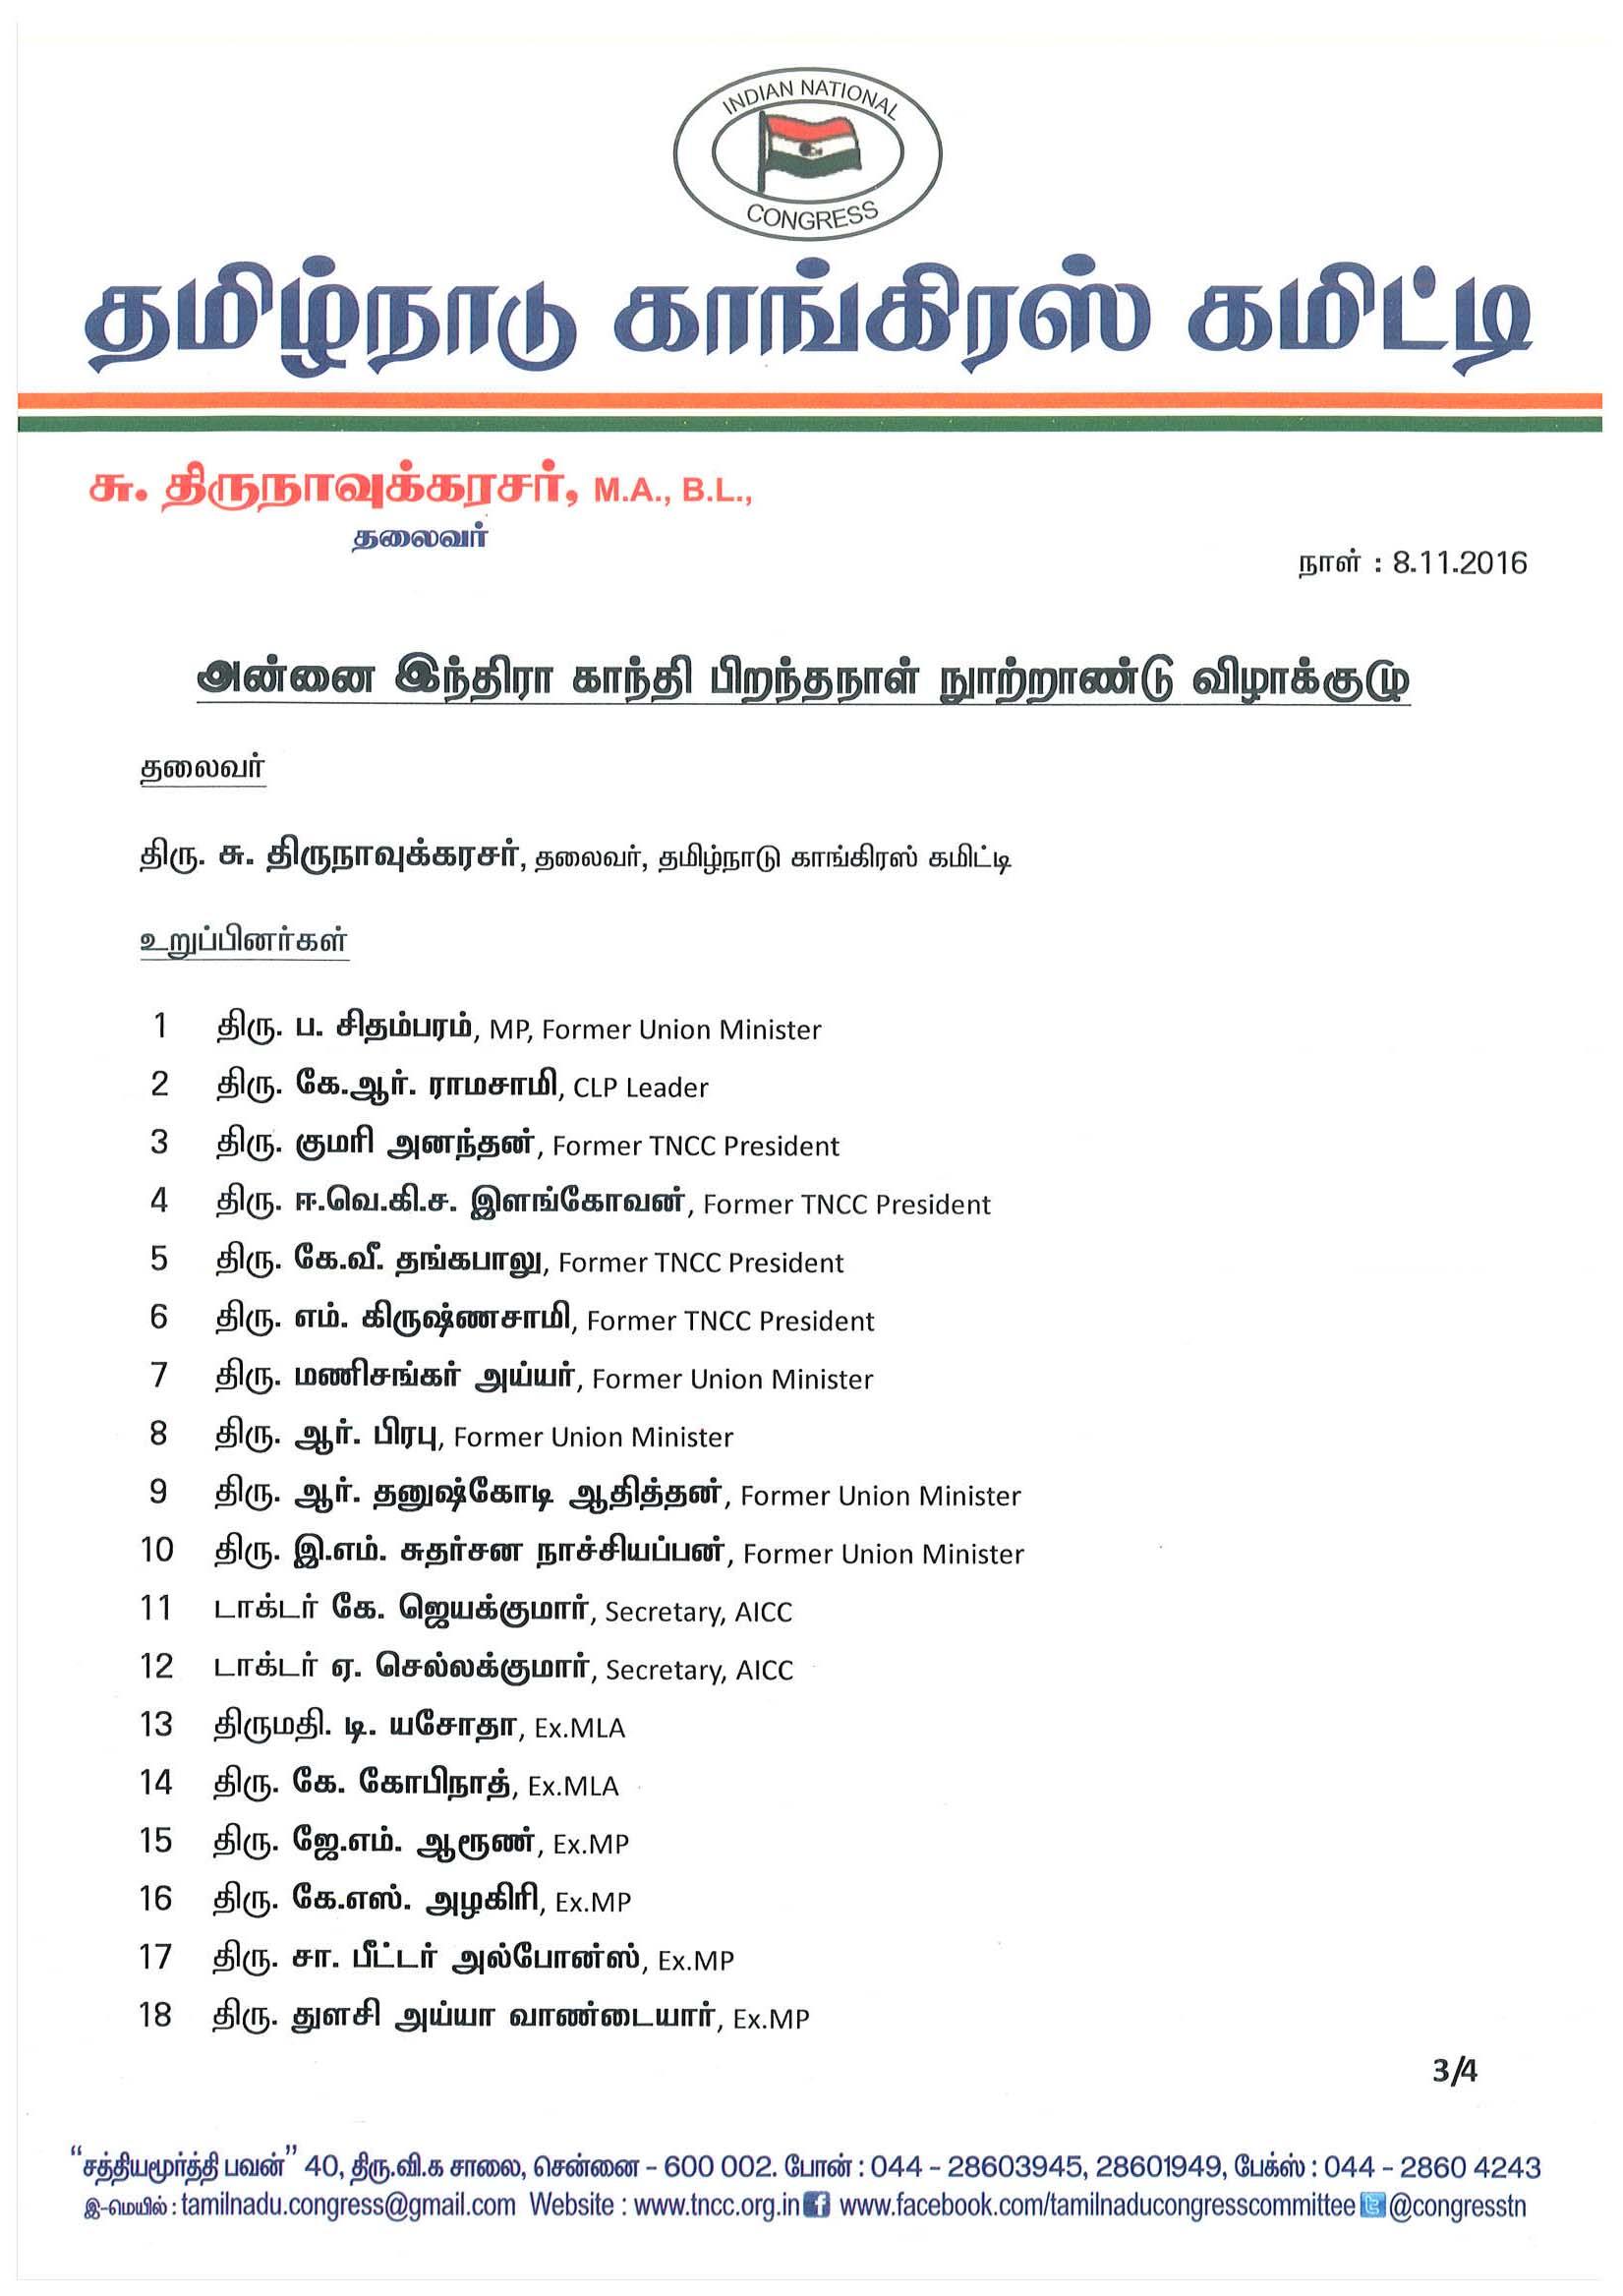 tncc-presidents-statement-8-11-2016-p3